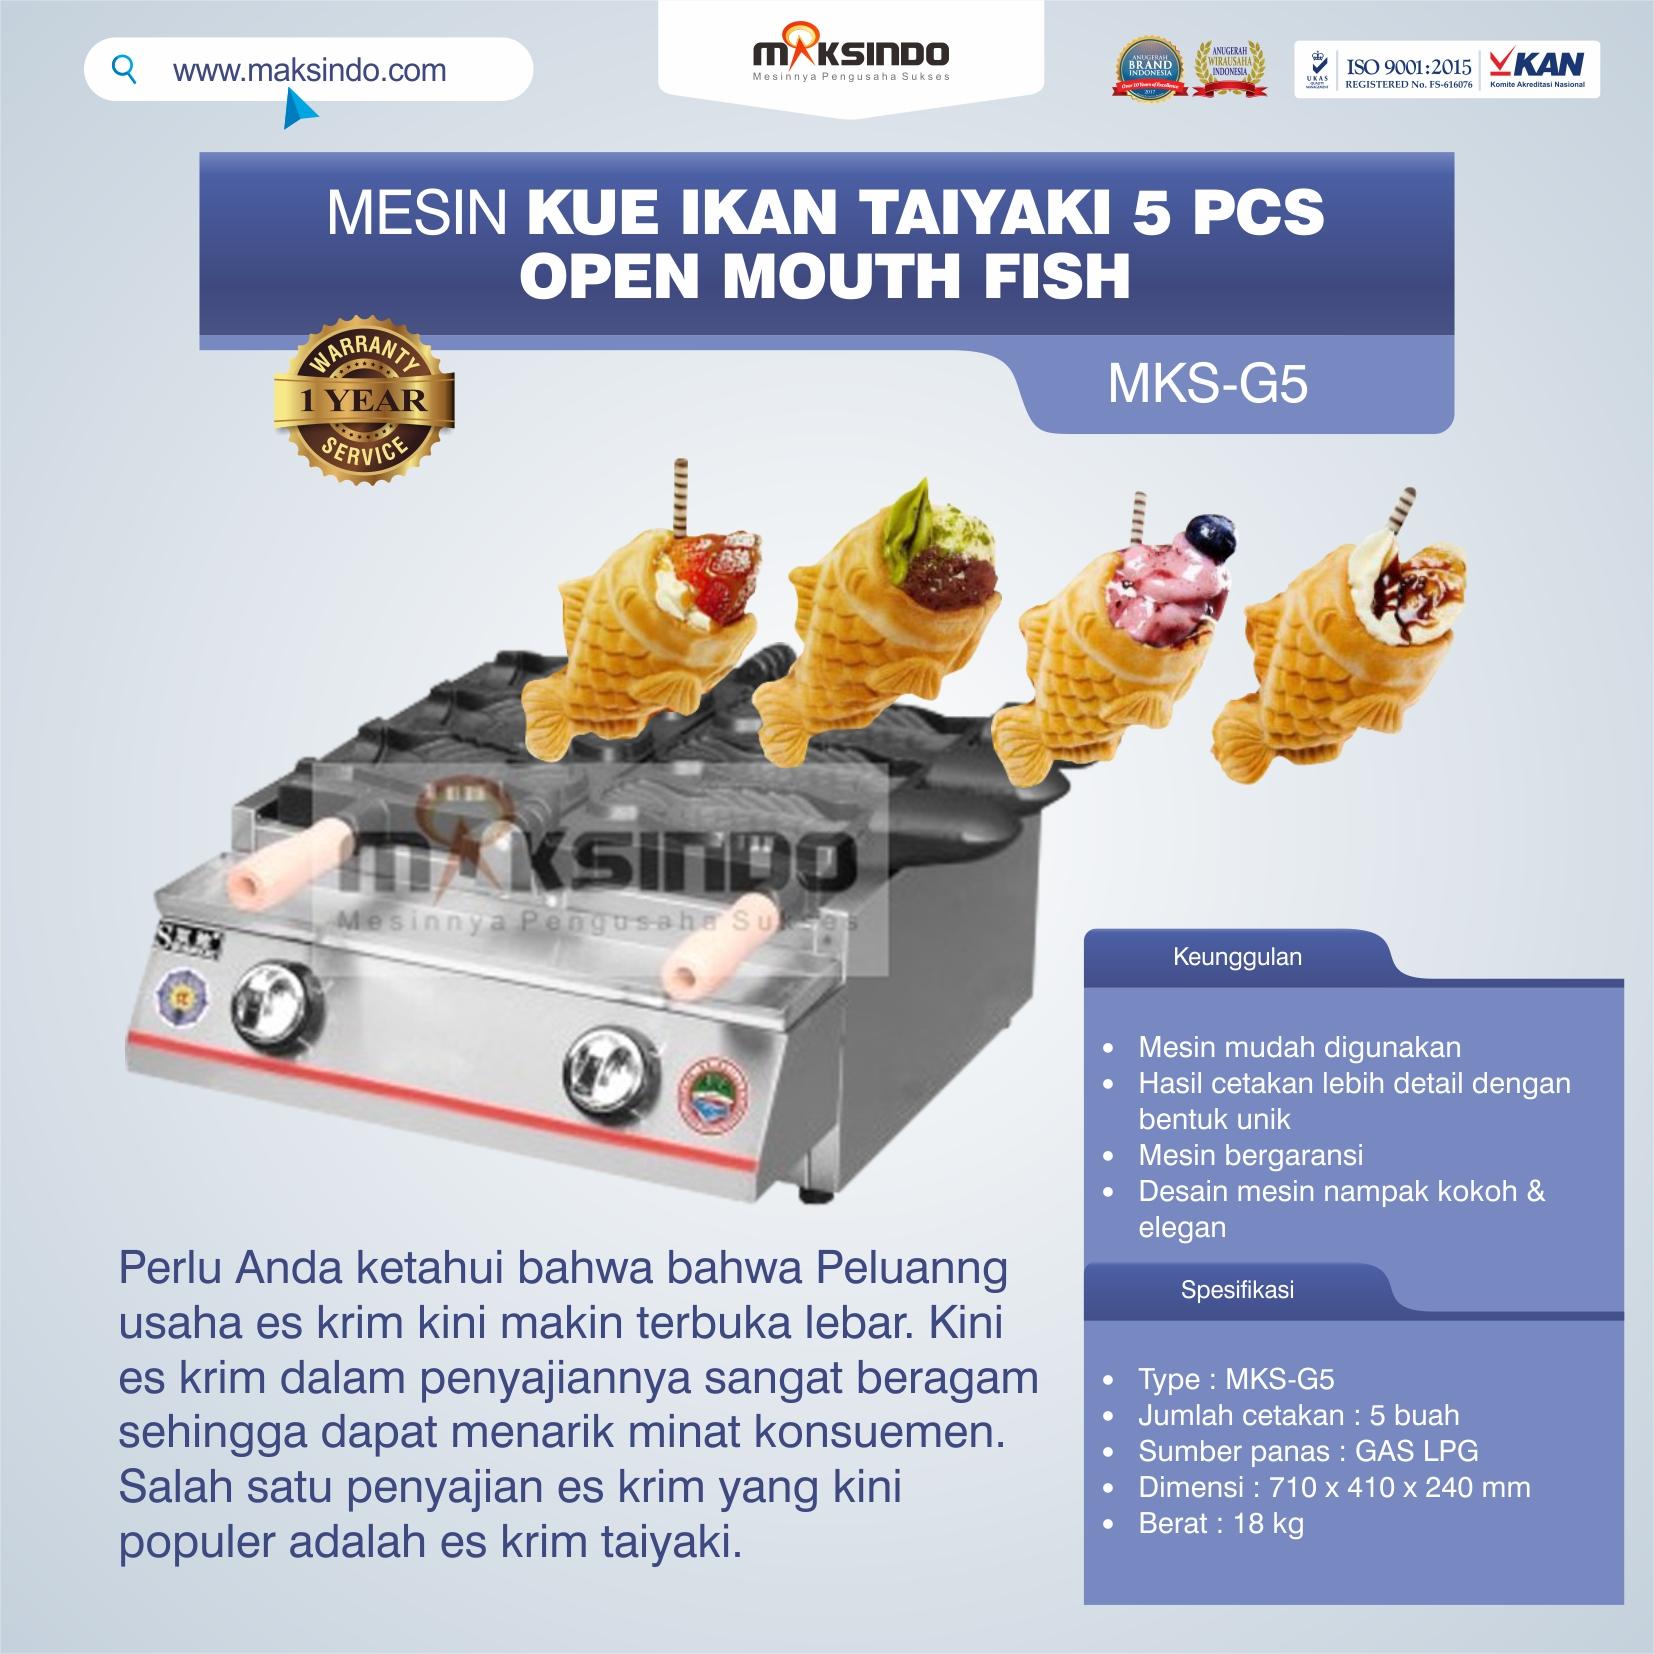 Jual Mesin Kue Ikan Taiyaki 5 Pcs – Open Mouth Fish MKS-G5 di Tangerang